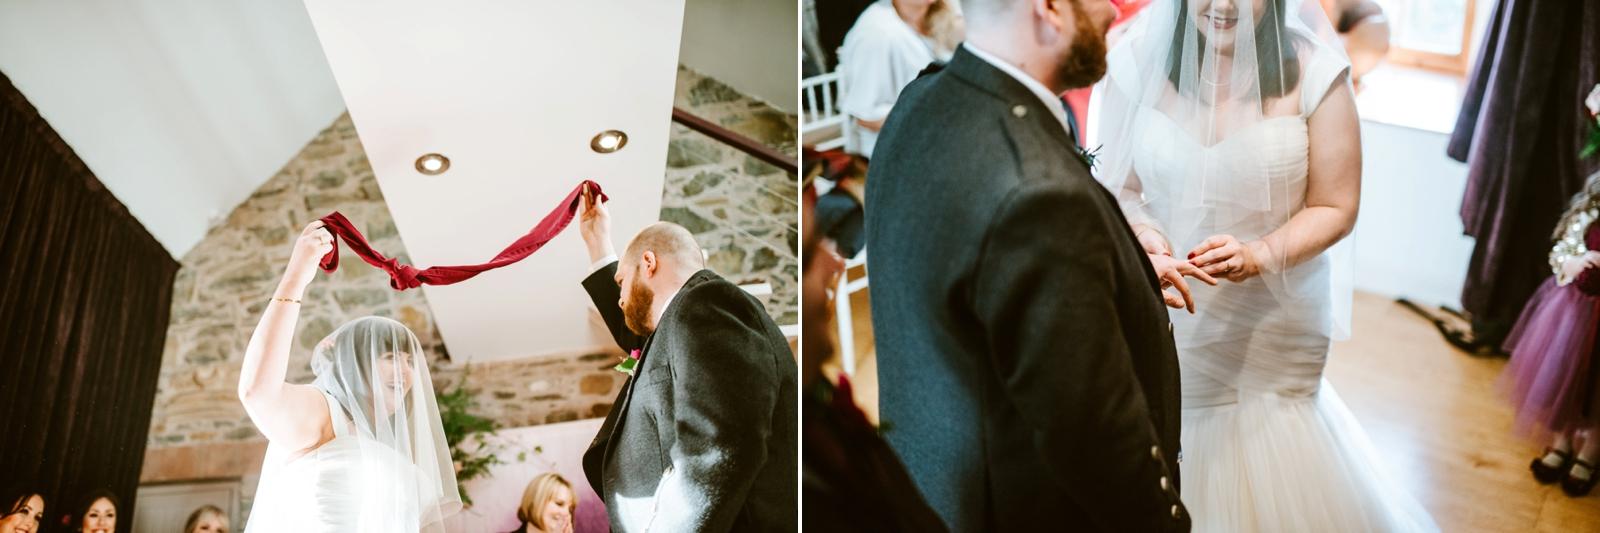 alternative-wedding-photography-scotland-katie-stephen-aikwood-tower-196.jpg